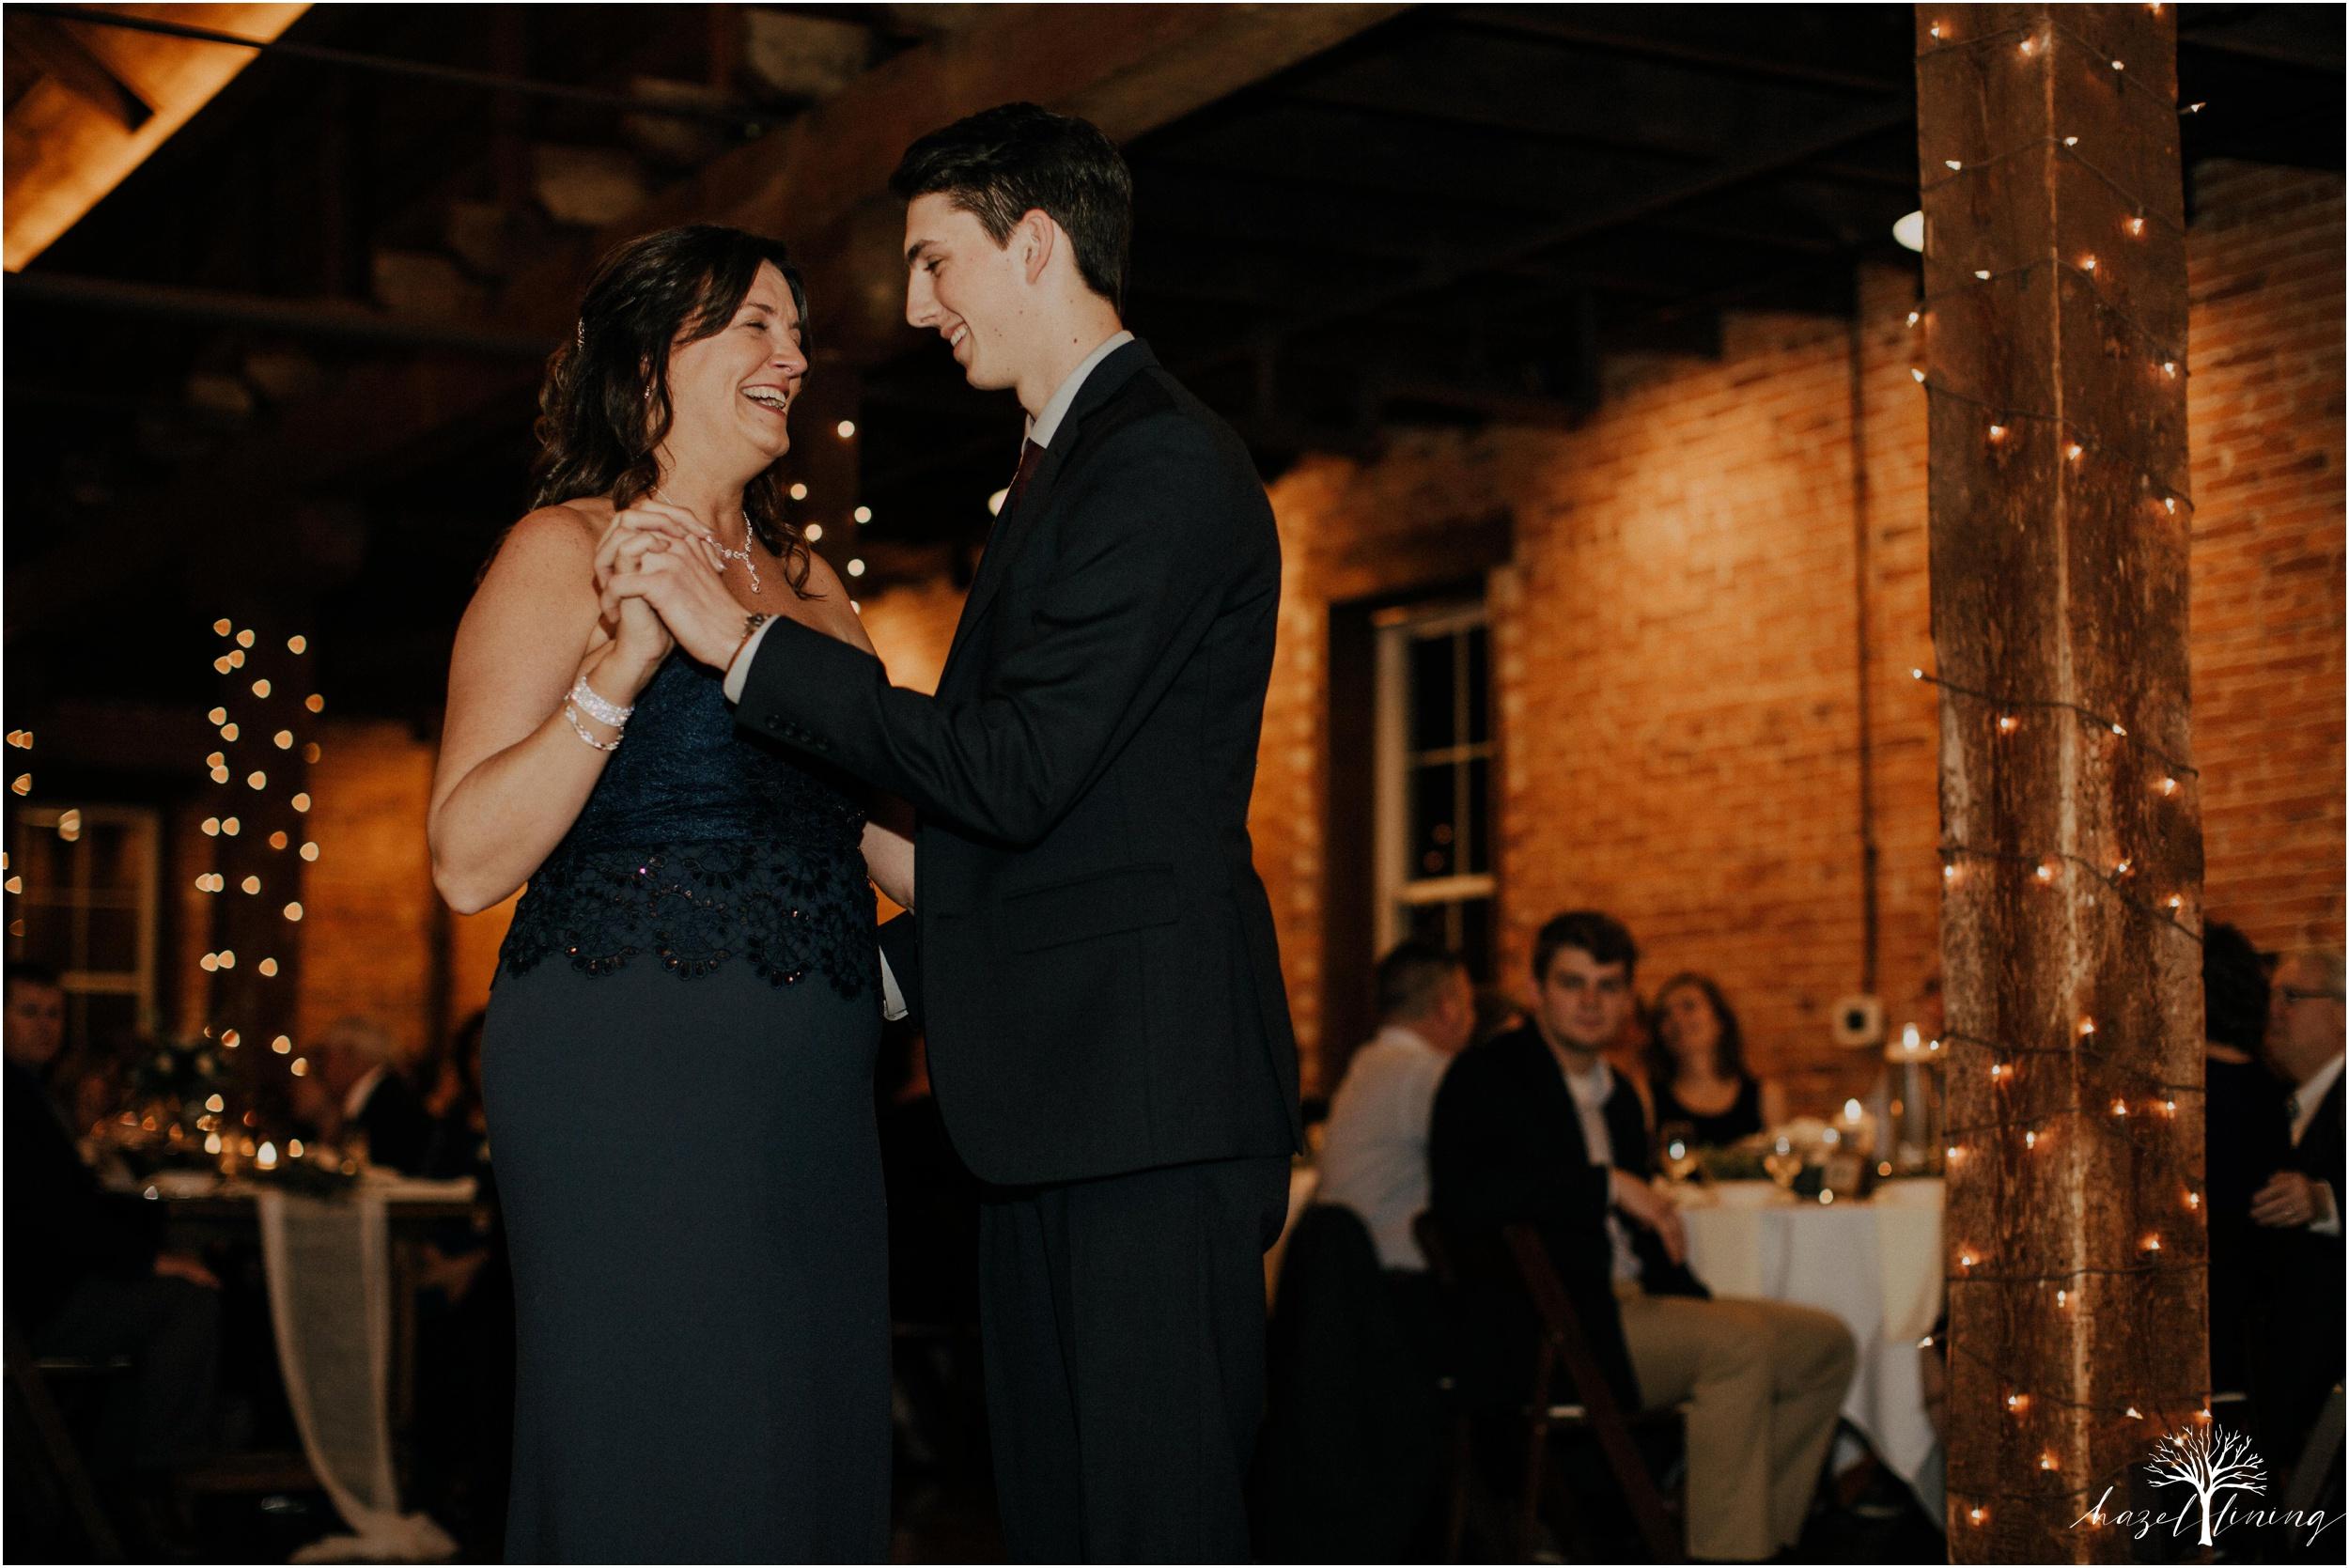 emma-matt-gehringer-the-booking-house-lancaster-manhiem-pennsylvania-winter-wedding_0156.jpg